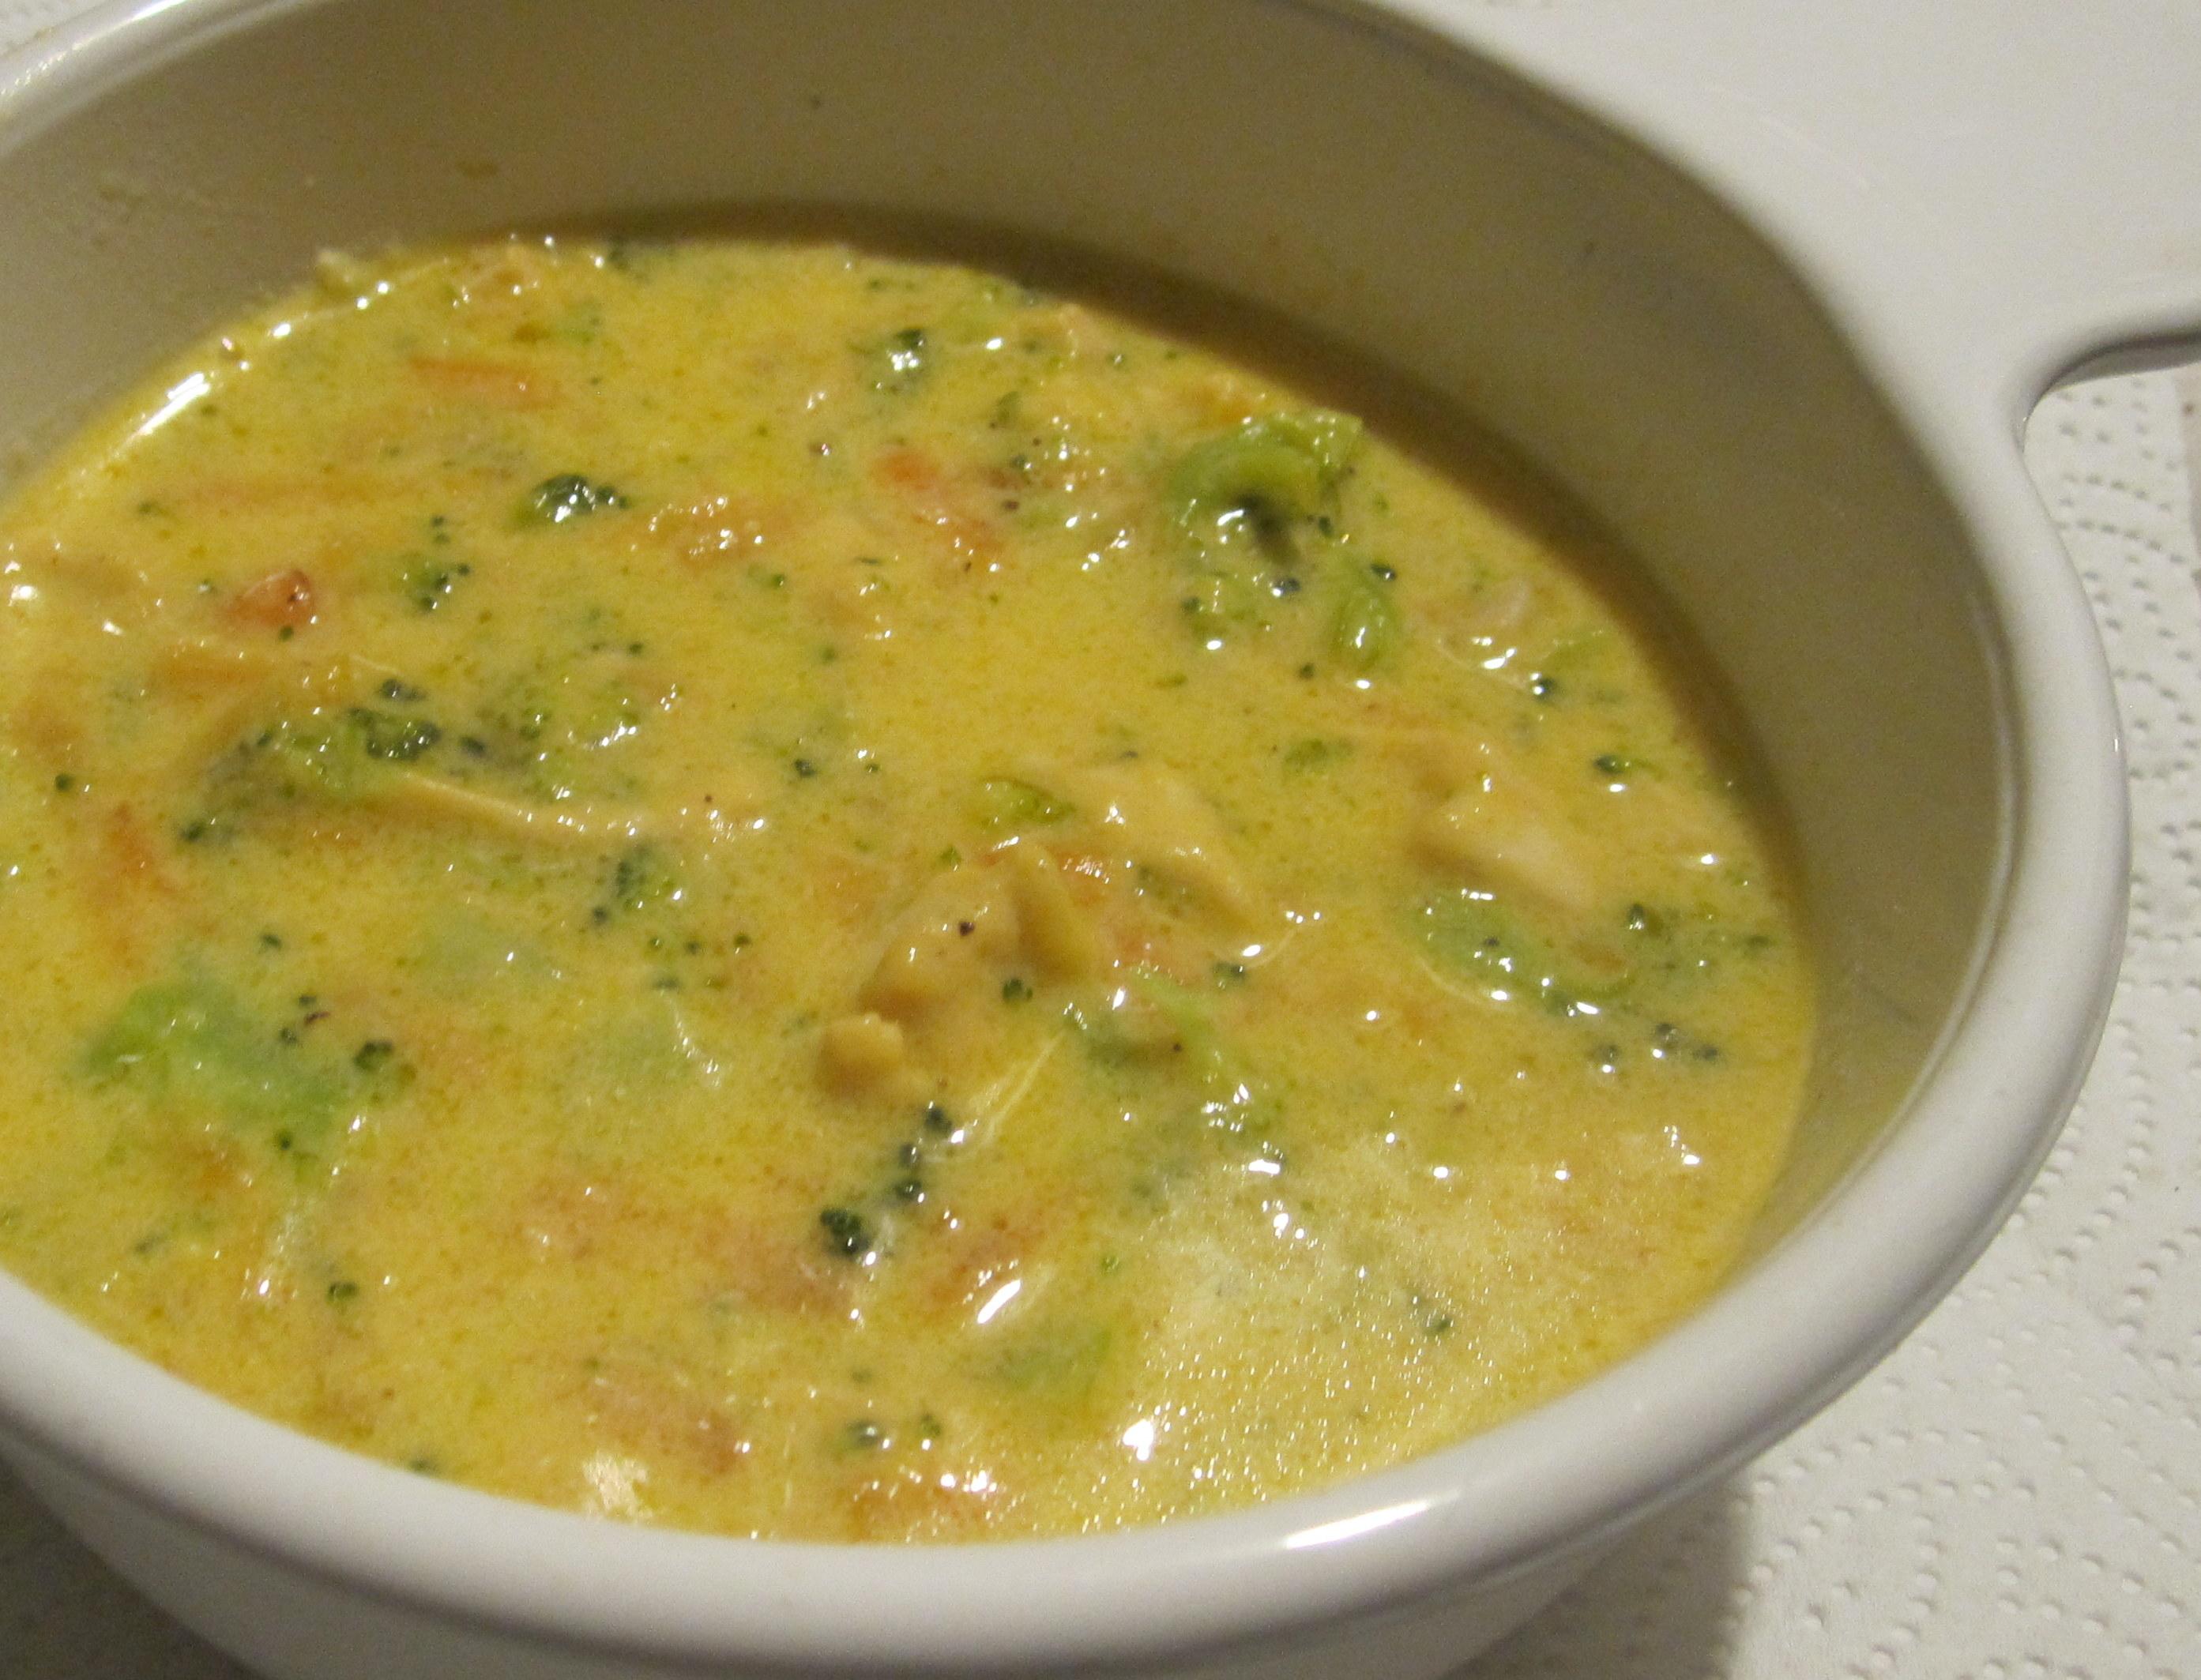 broccoli cheddar chicken soup 2014